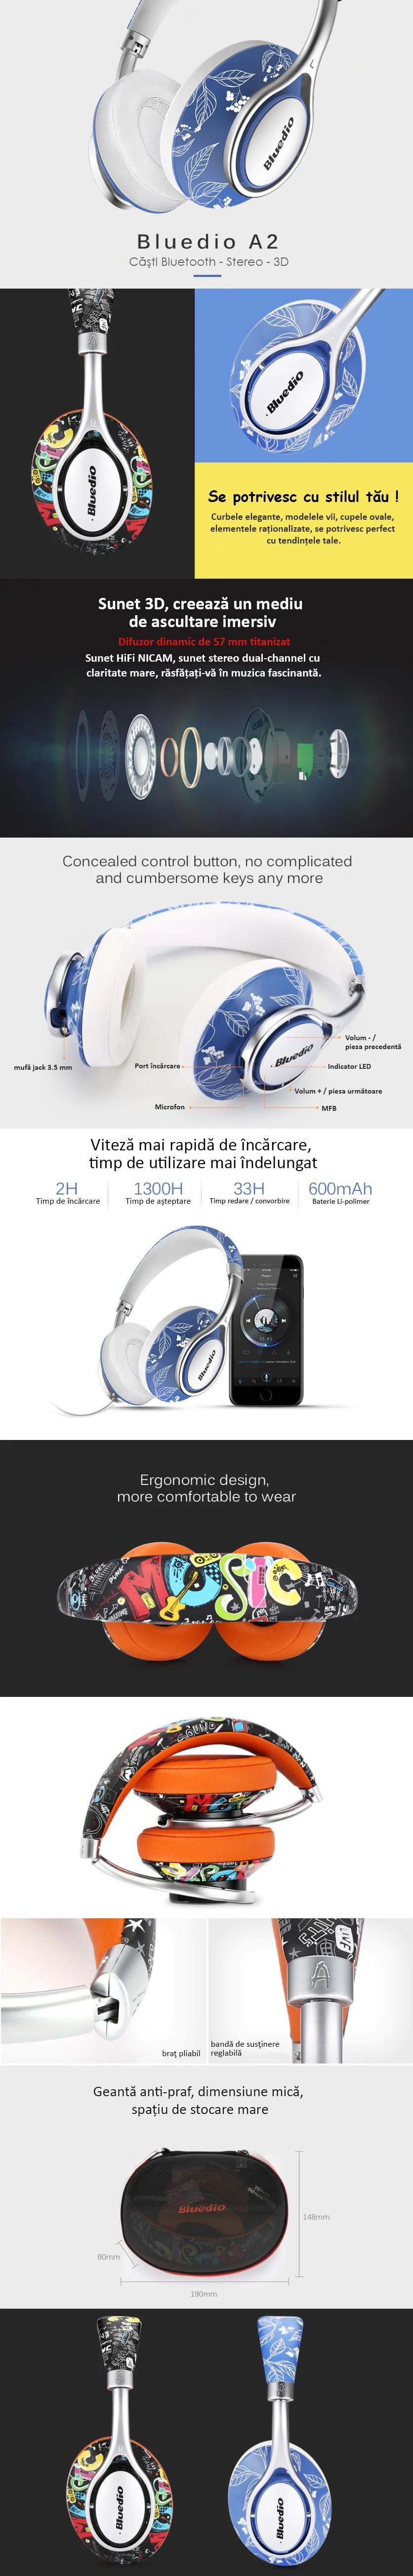 screencapture-dualstore-ro-gadgeturicastiincarcatoare-si-cabluri-usb-1196-casti-bluetooth-bluedio-a2-air-bluetooth-4-2-wireless-stereo-microfon-incorporat-html-2018-10-04-10_51_03a005913379c11baf.jpg